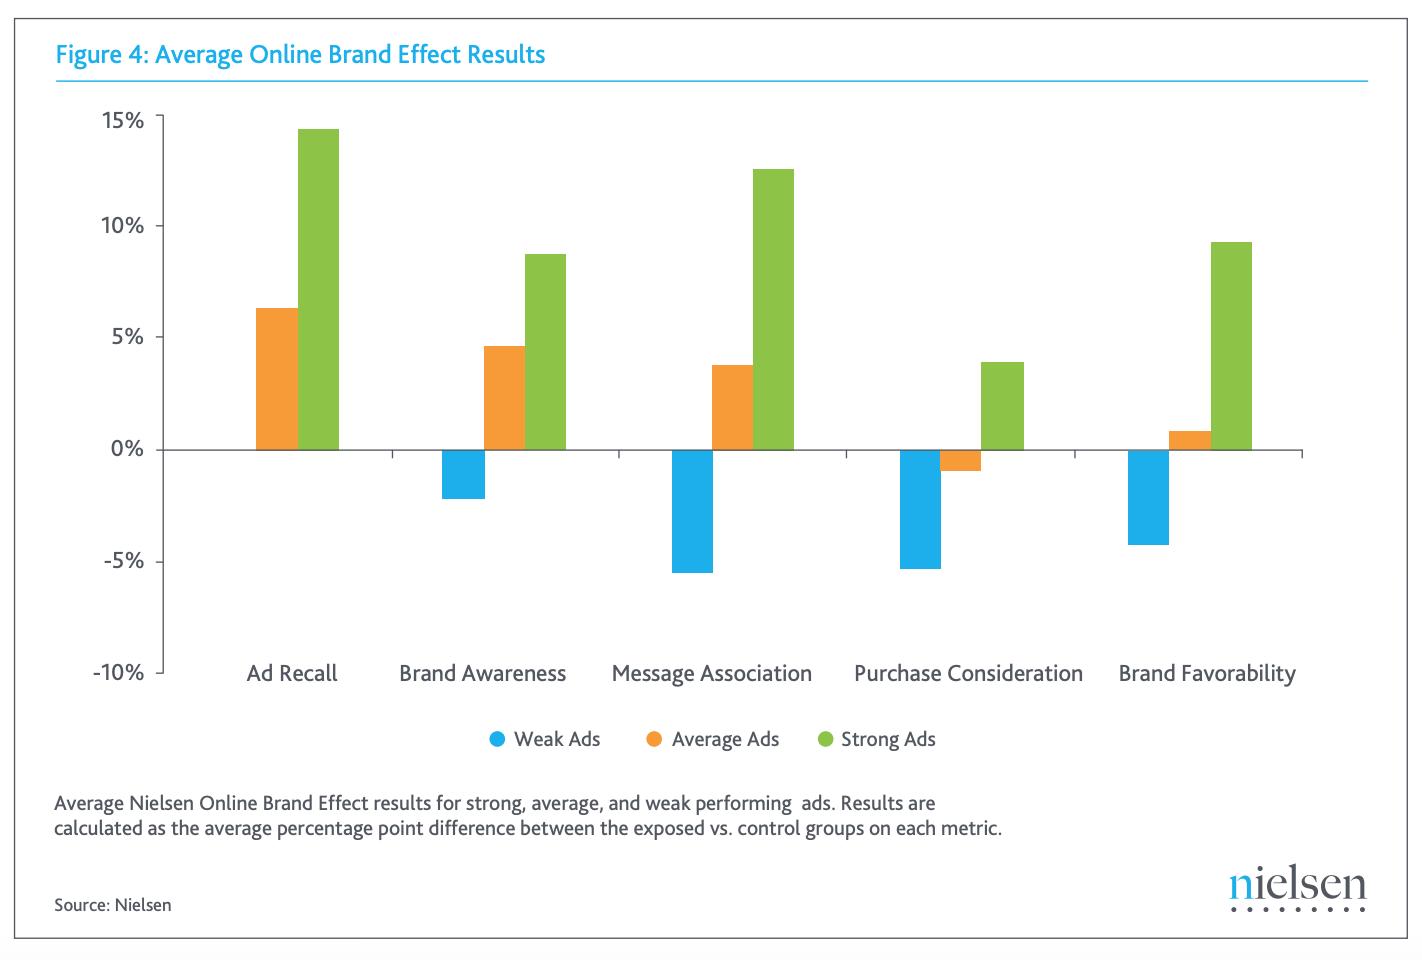 Average Online Brand Effect Results